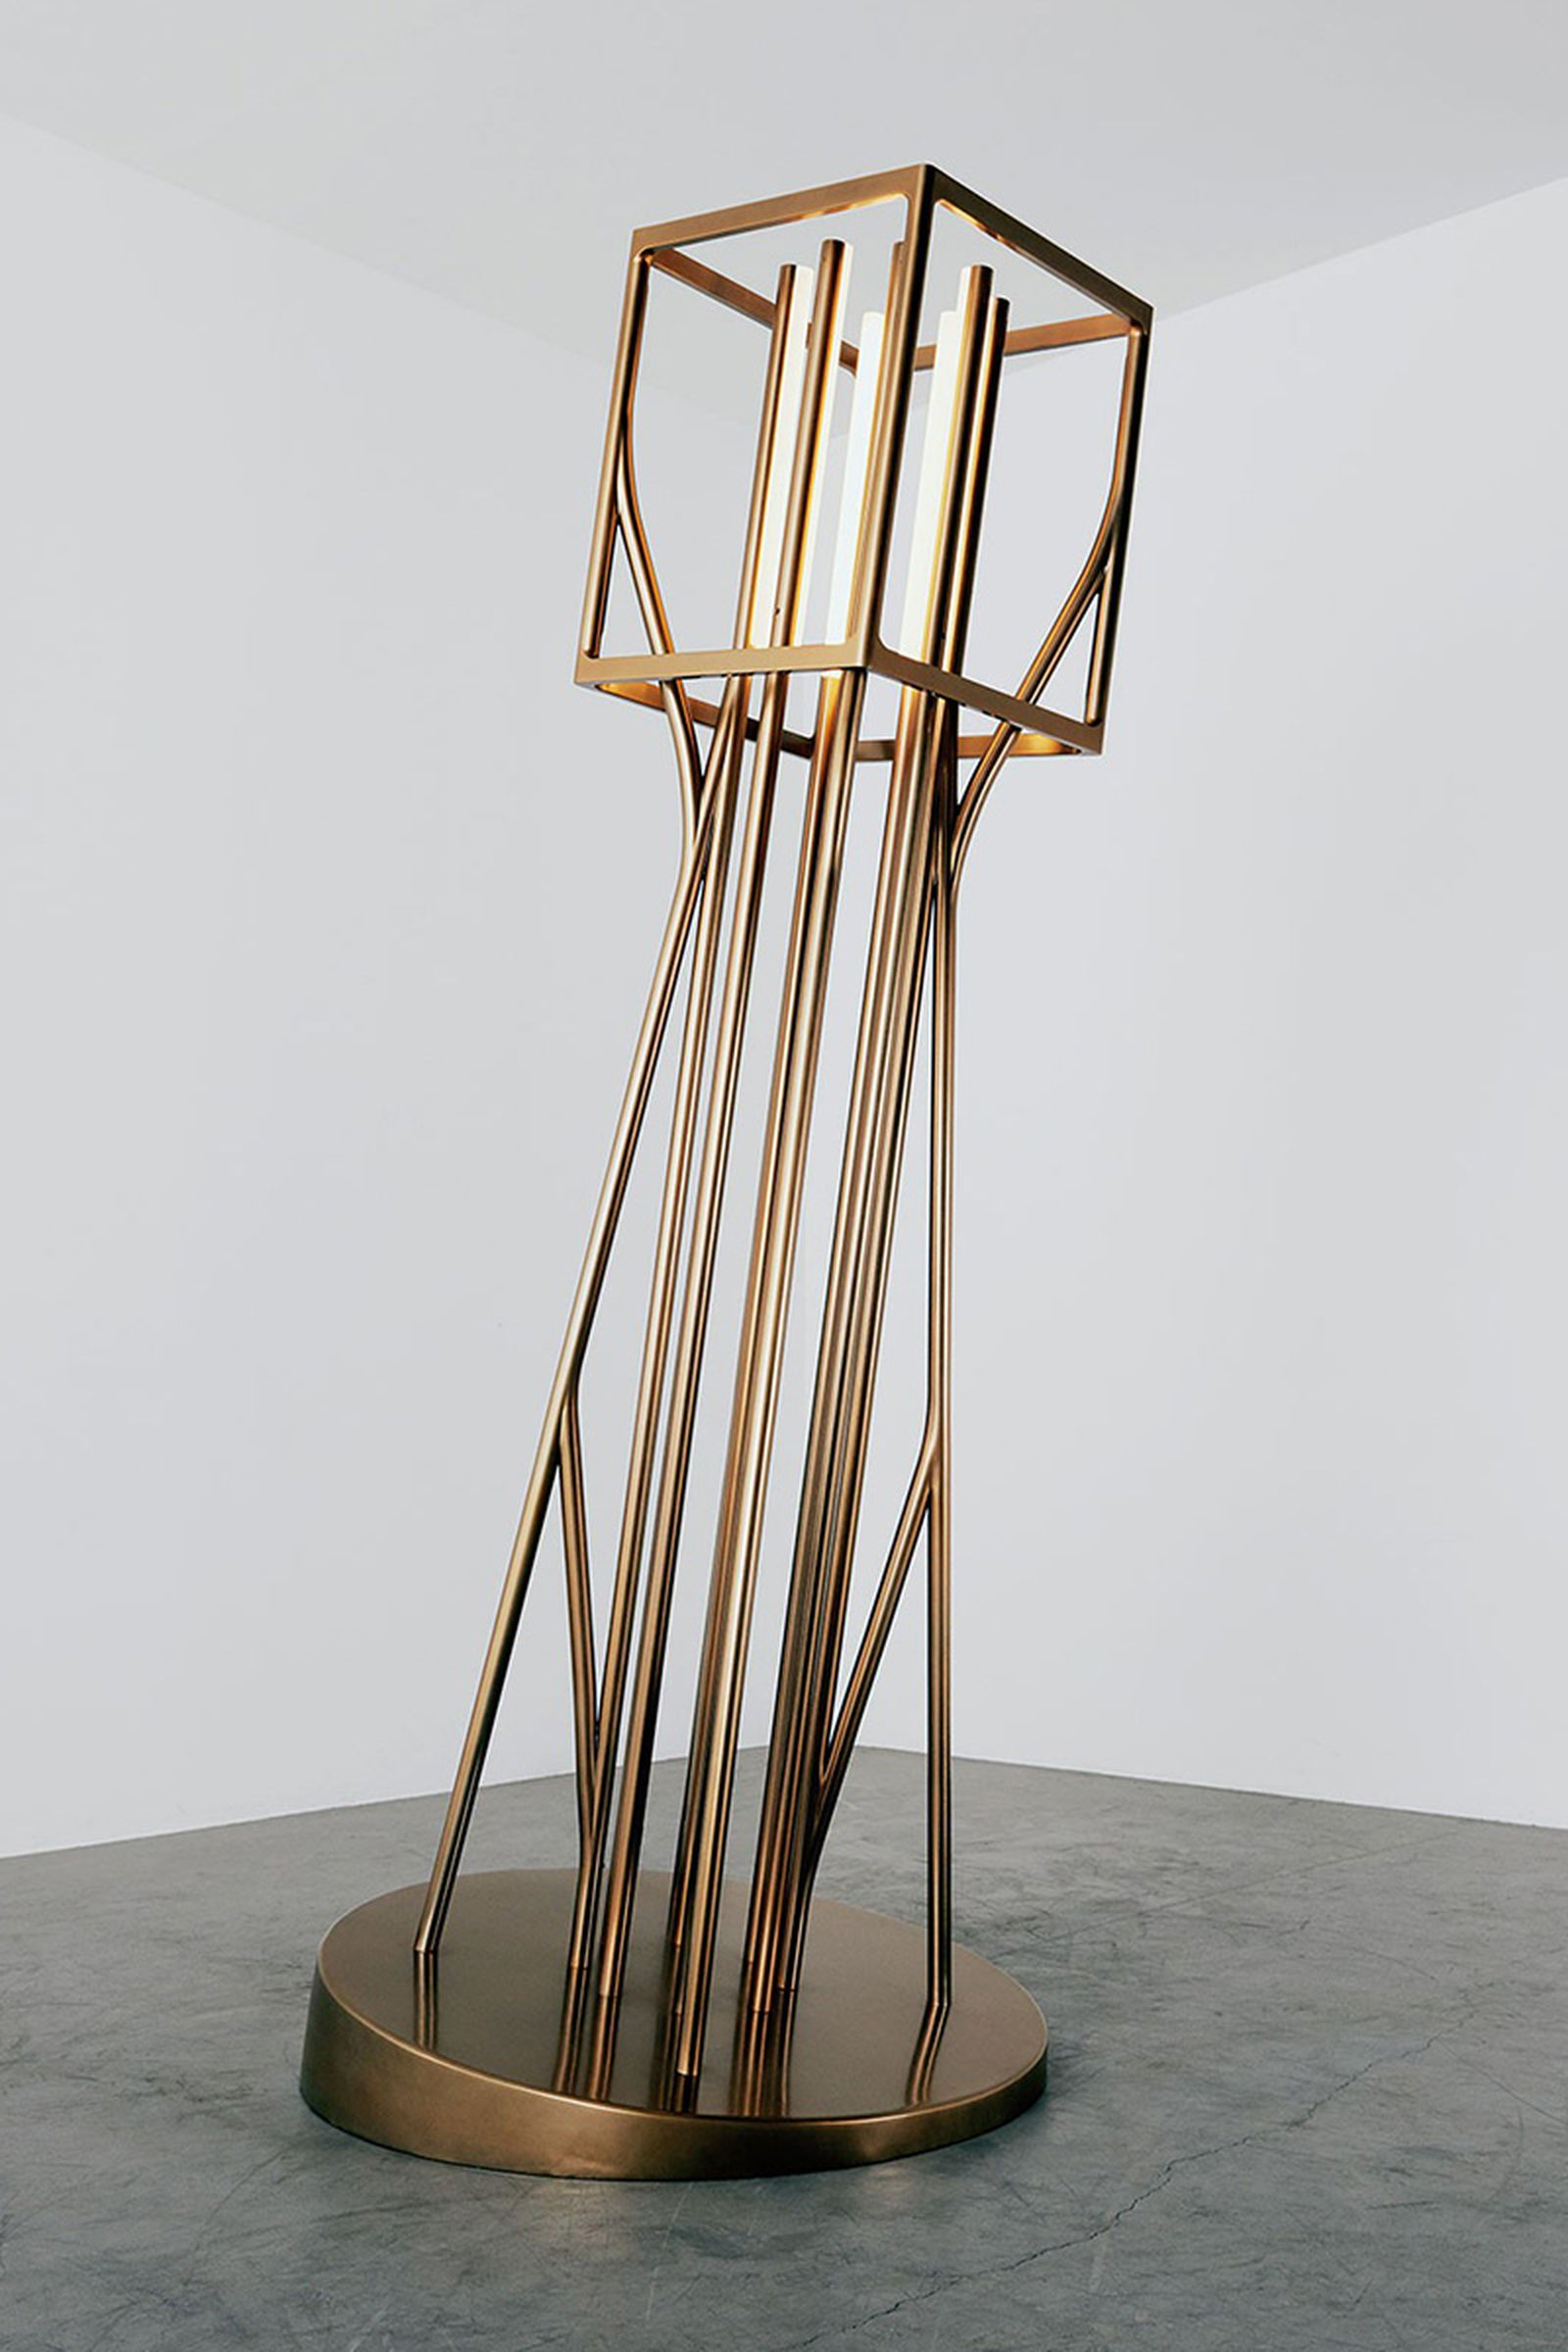 virgil abloh acqua alta furniture collection venice biennale